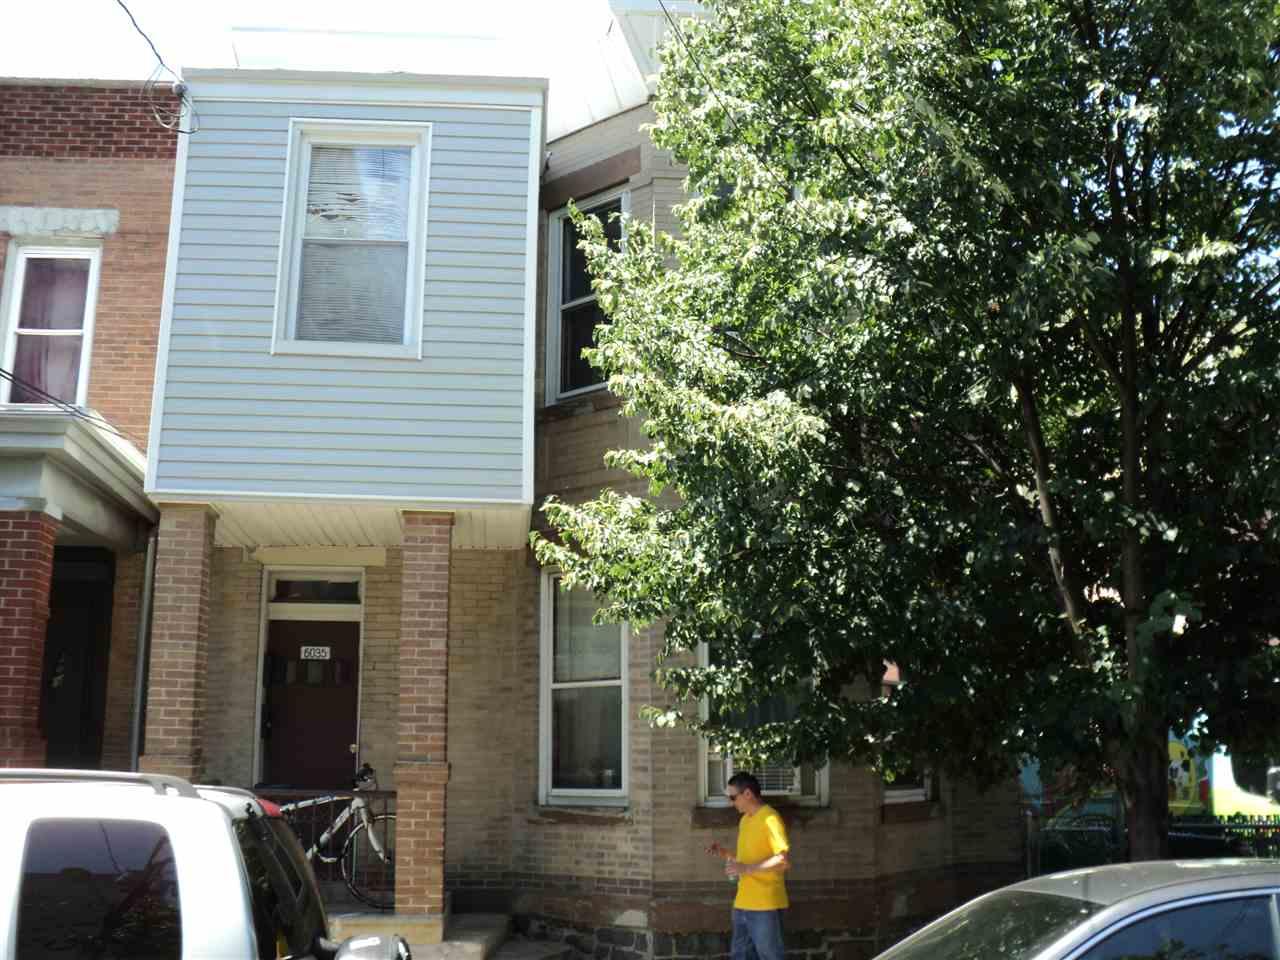 6035 MONROE PL, West New York, NJ 07093